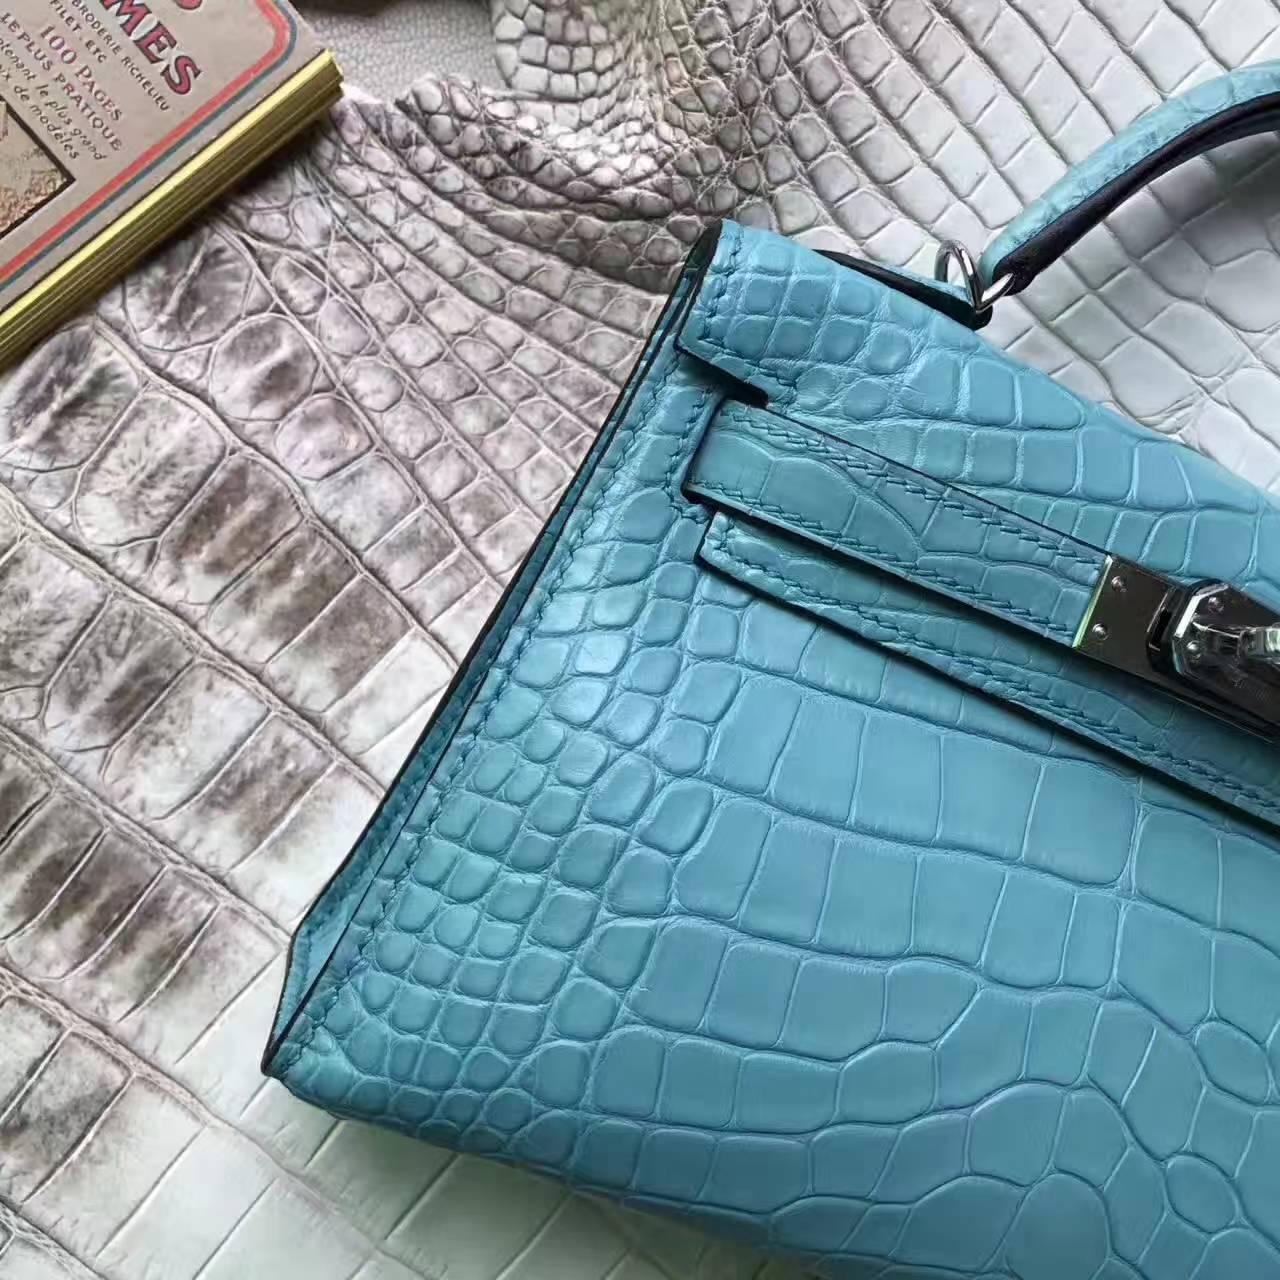 Hot Sale Hermes 3Z Blue Saint-cyr Crocodile Leather Minikelly-2 Clutch Bag